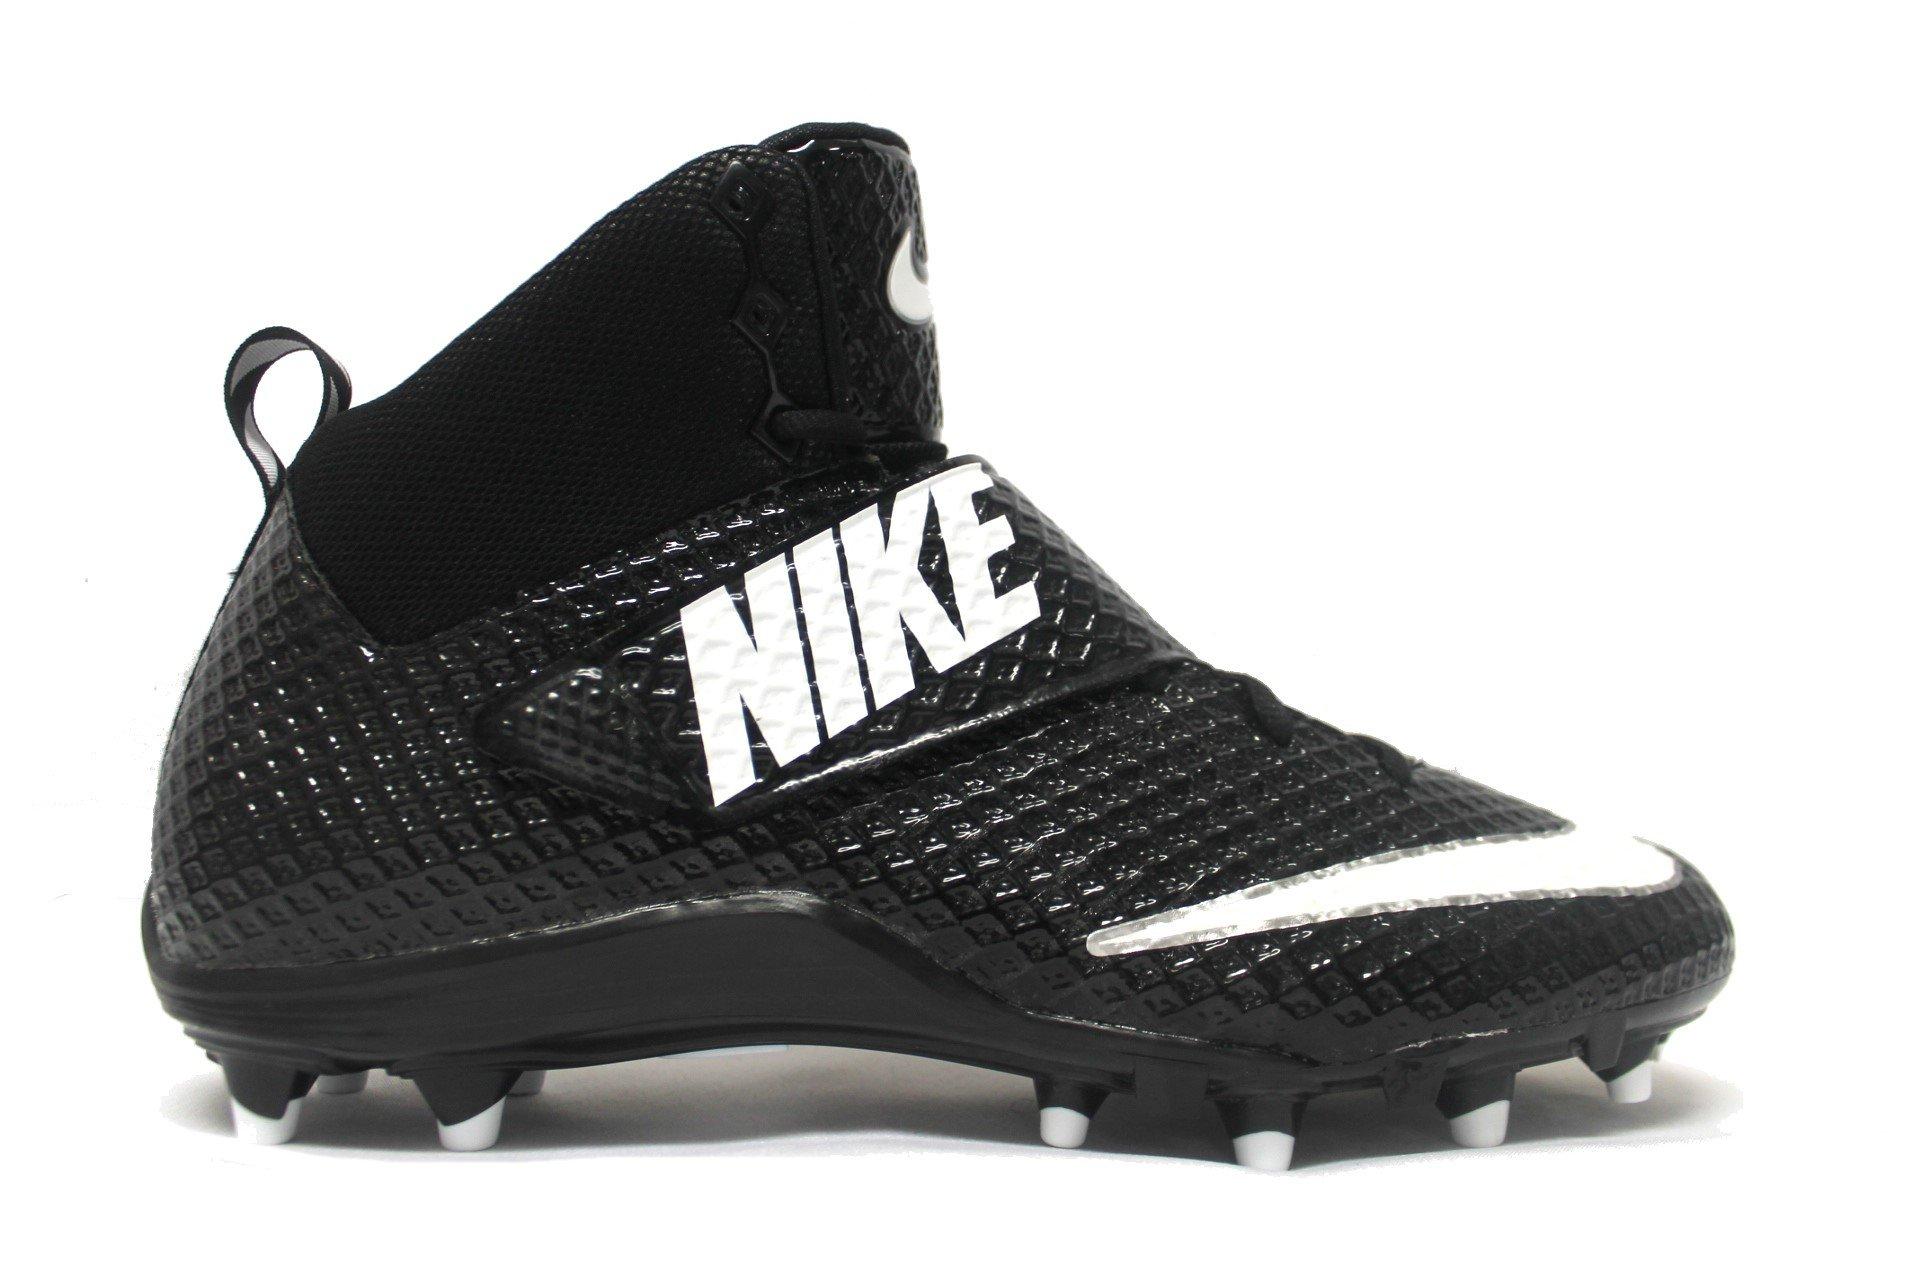 NIKE Lunarbeast Pro TD CF Football Cleats (12.5, Black/White)